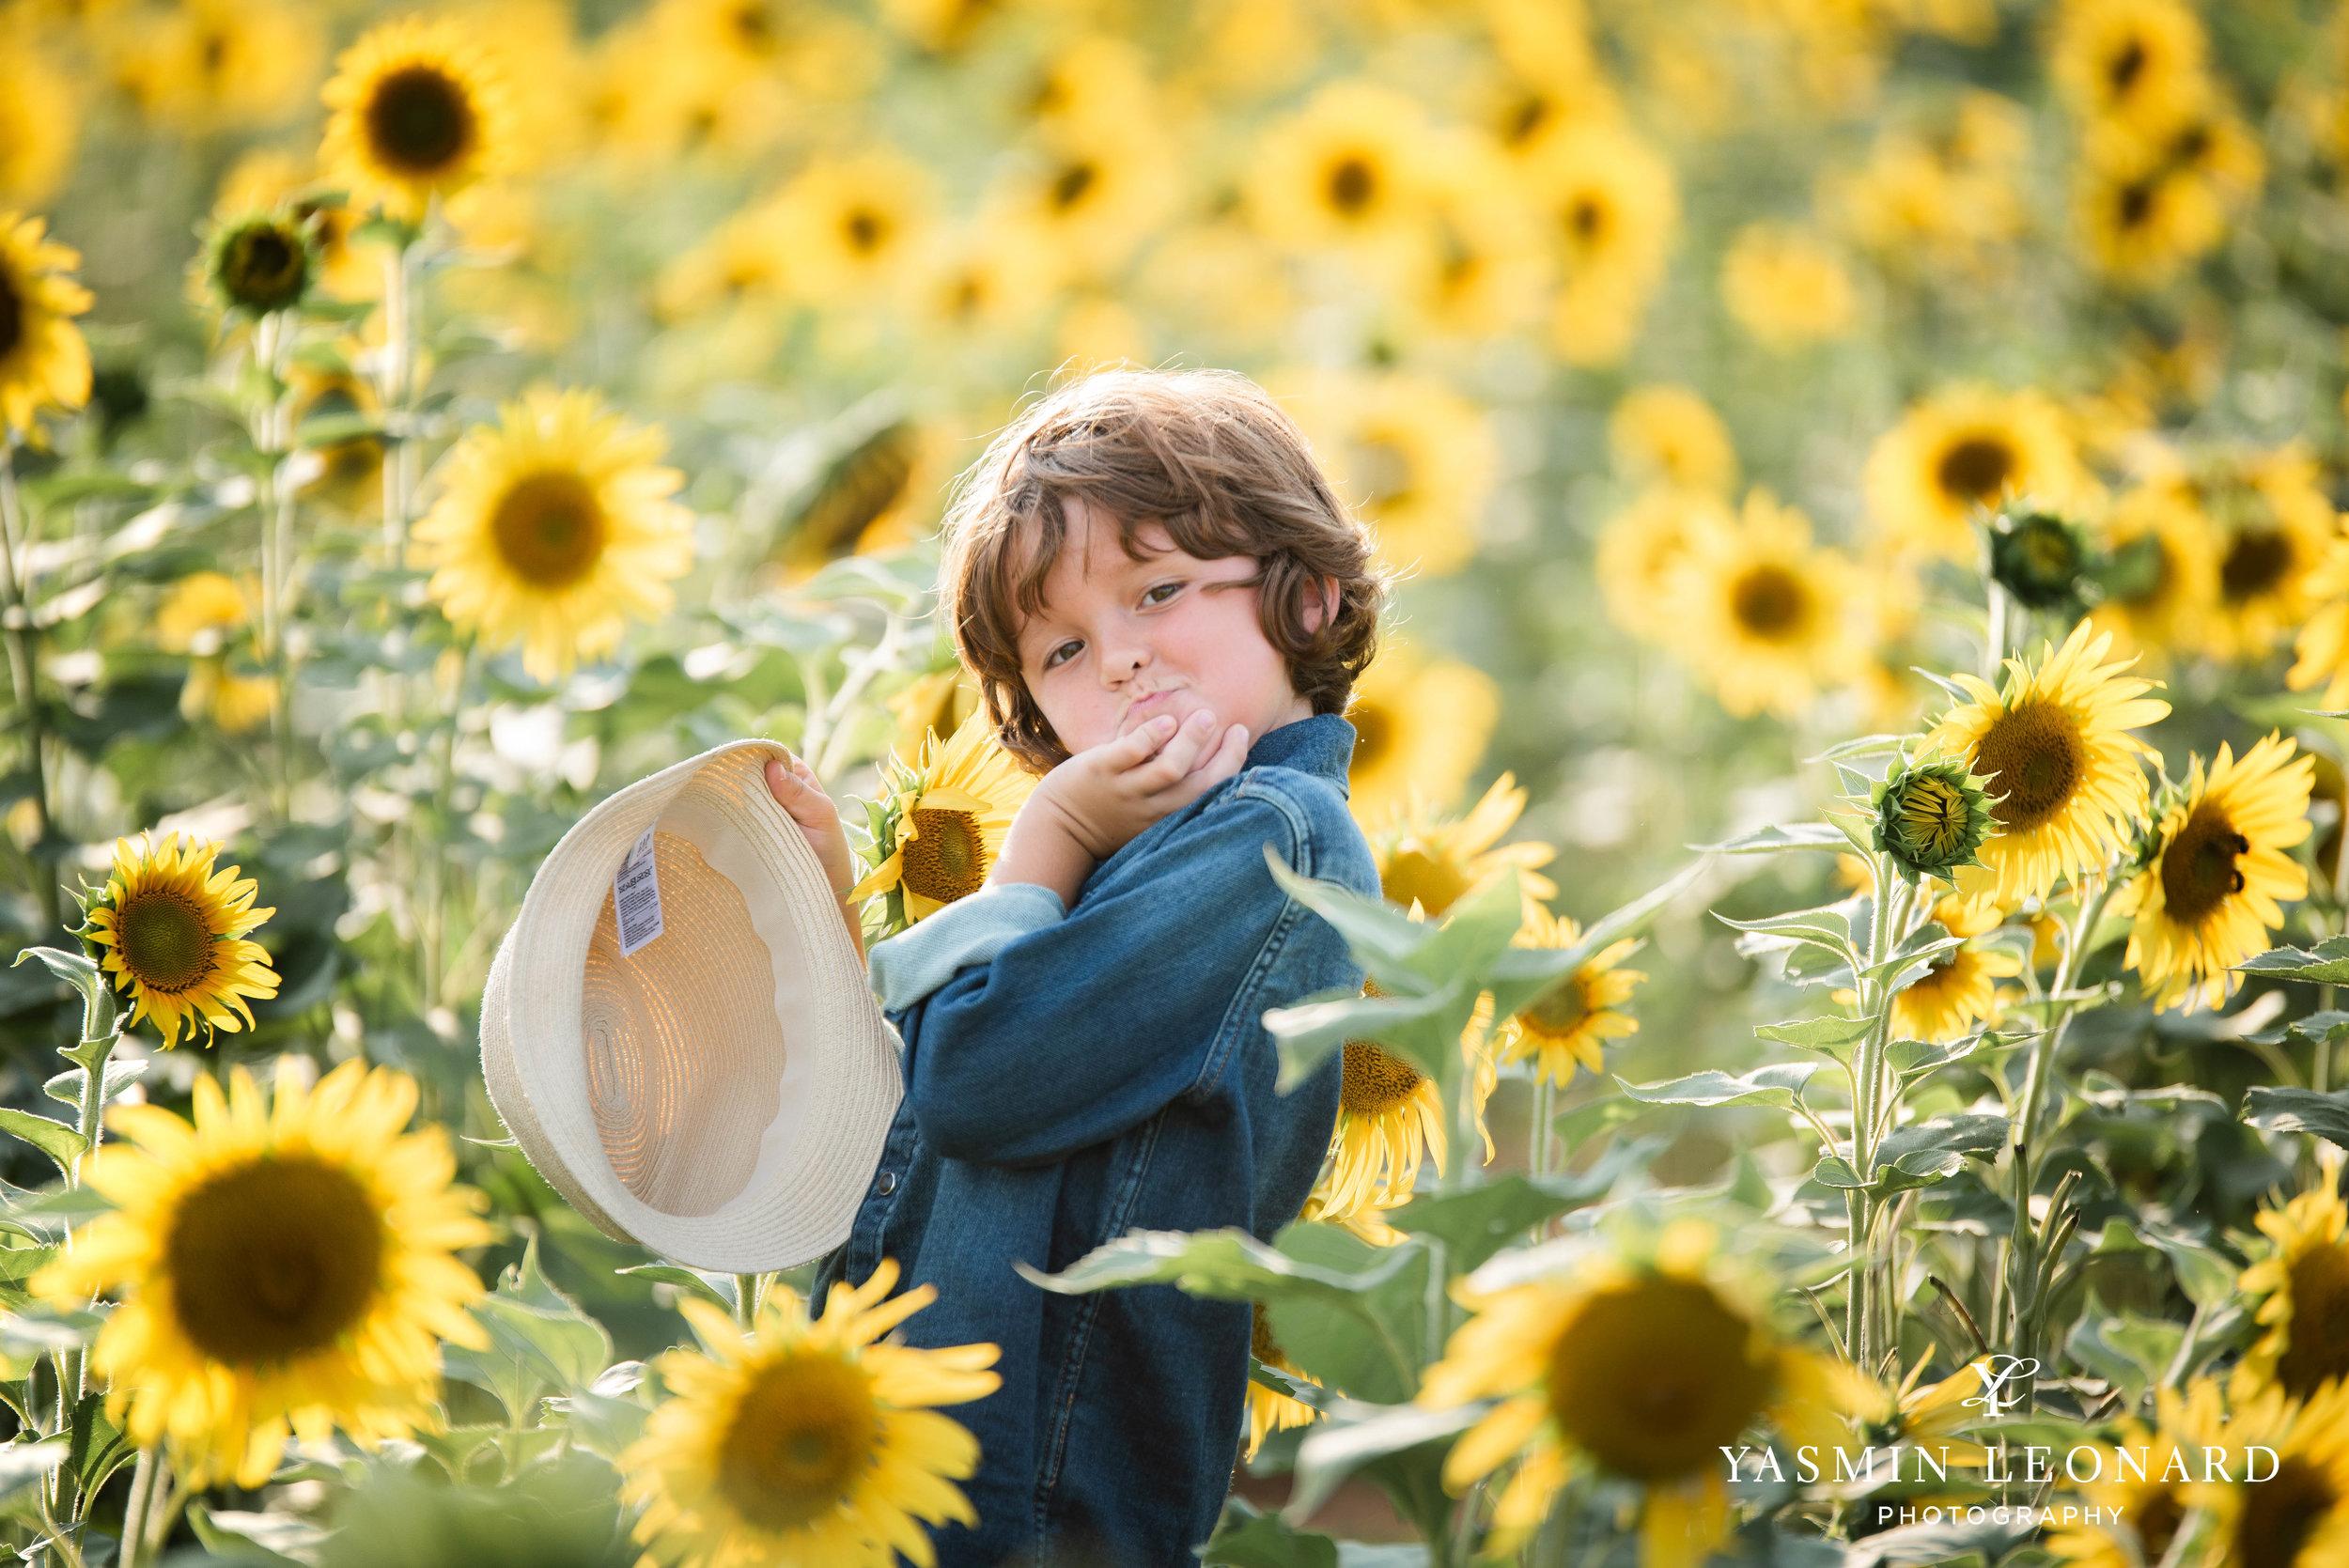 Sunflower Mini Session - Dogwood Farms - Sunflower Field - Boys in Sunflower Field - What to wear sunflower field - Yasmin Leonard Photography-7.jpg